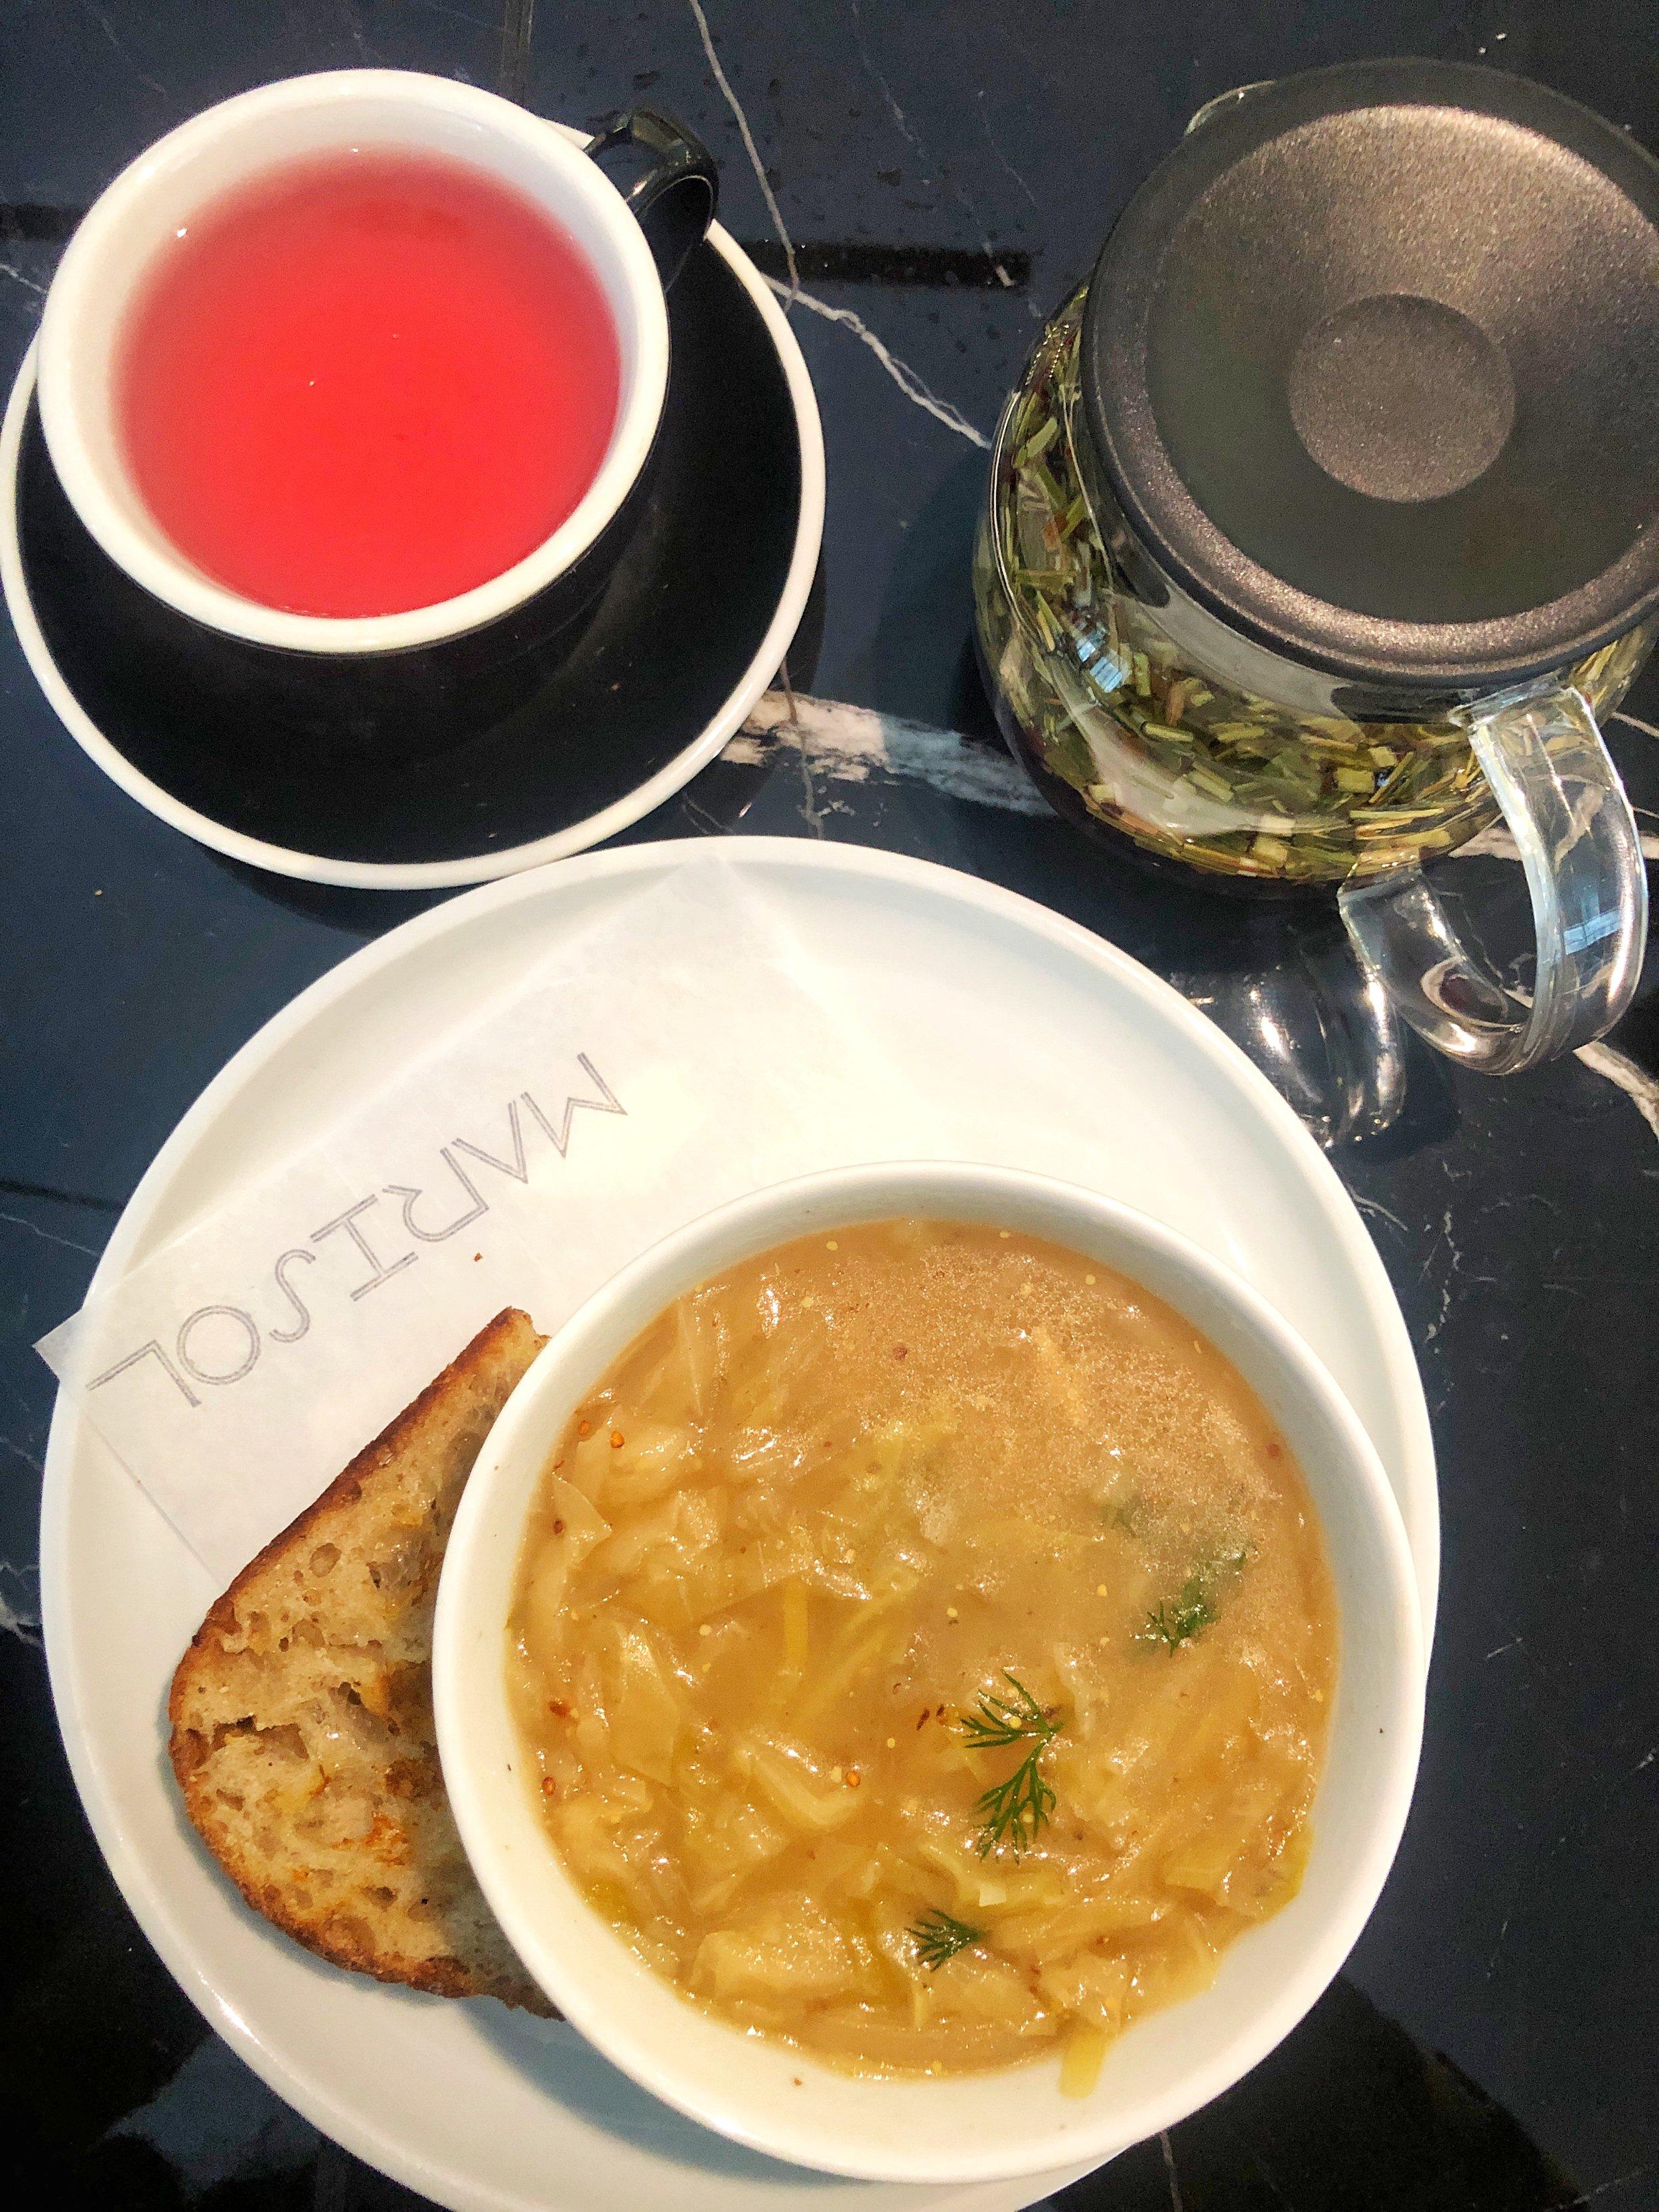 Onion, fennel, potato soup with a side of tea